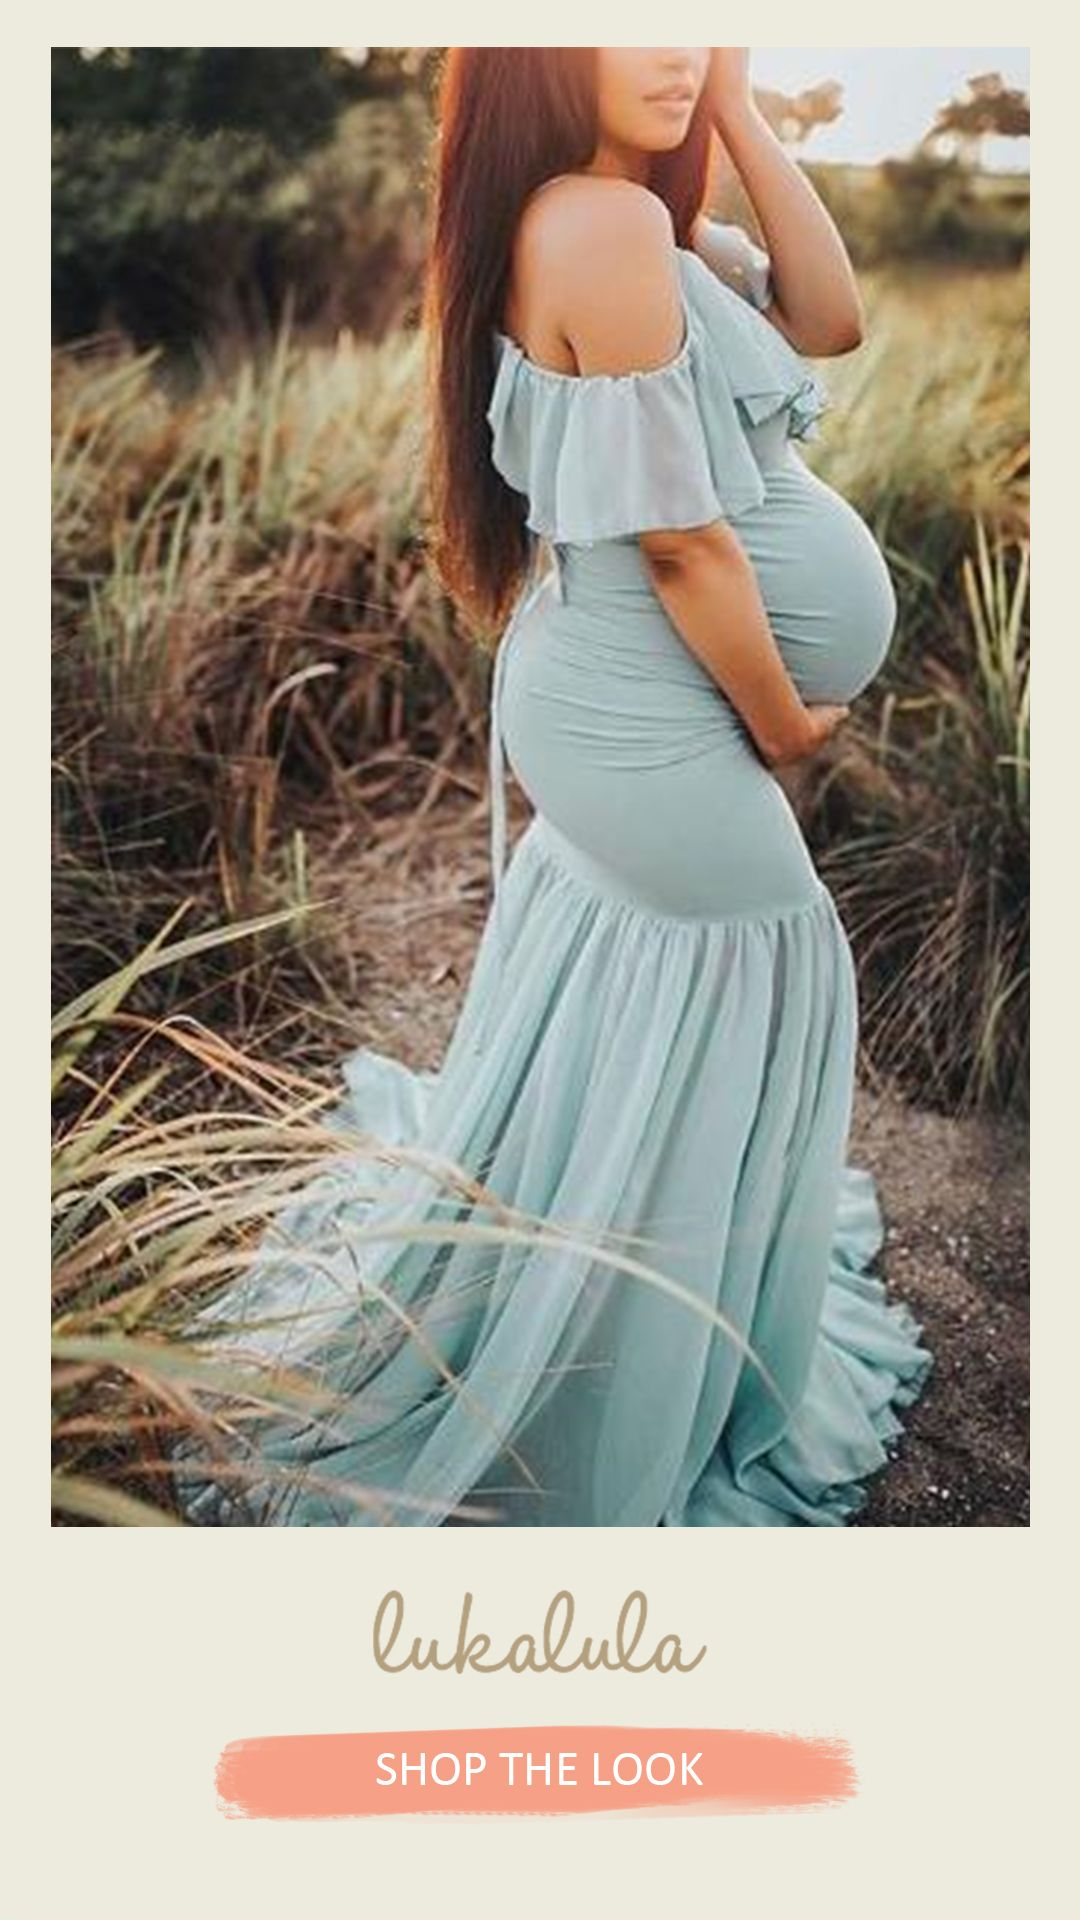 bad65adb2e201 Maternity Floral Print Dress#pregnant #pregnancy #preggo #34weekspregnant  #inspirepregnancy #pregnantbelly #pregnantfashion #fashionlover  #pregnant2018